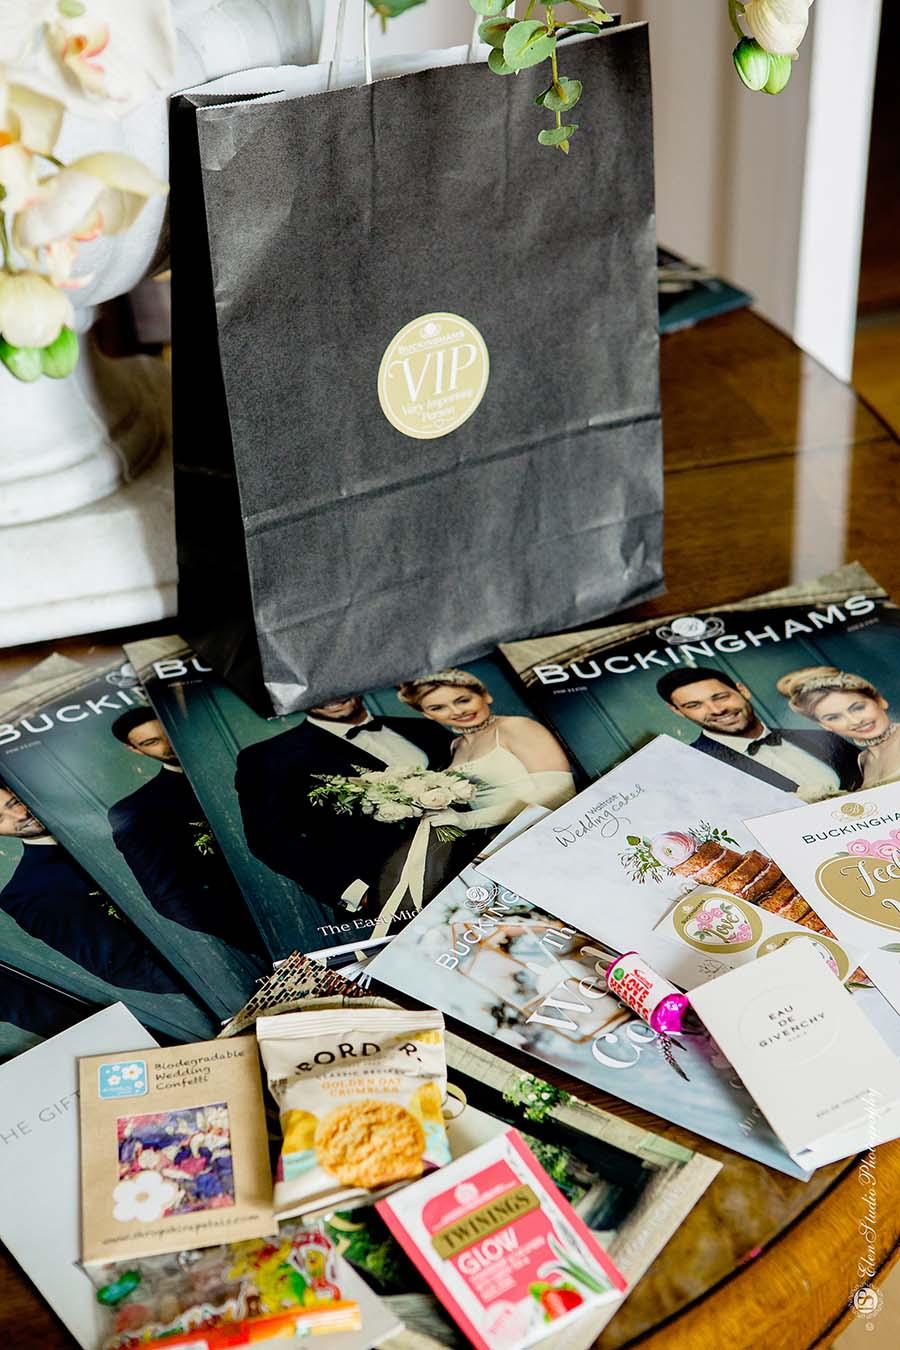 Hodsock-priory-wedding-fair-Elen-Studio-Photography-049